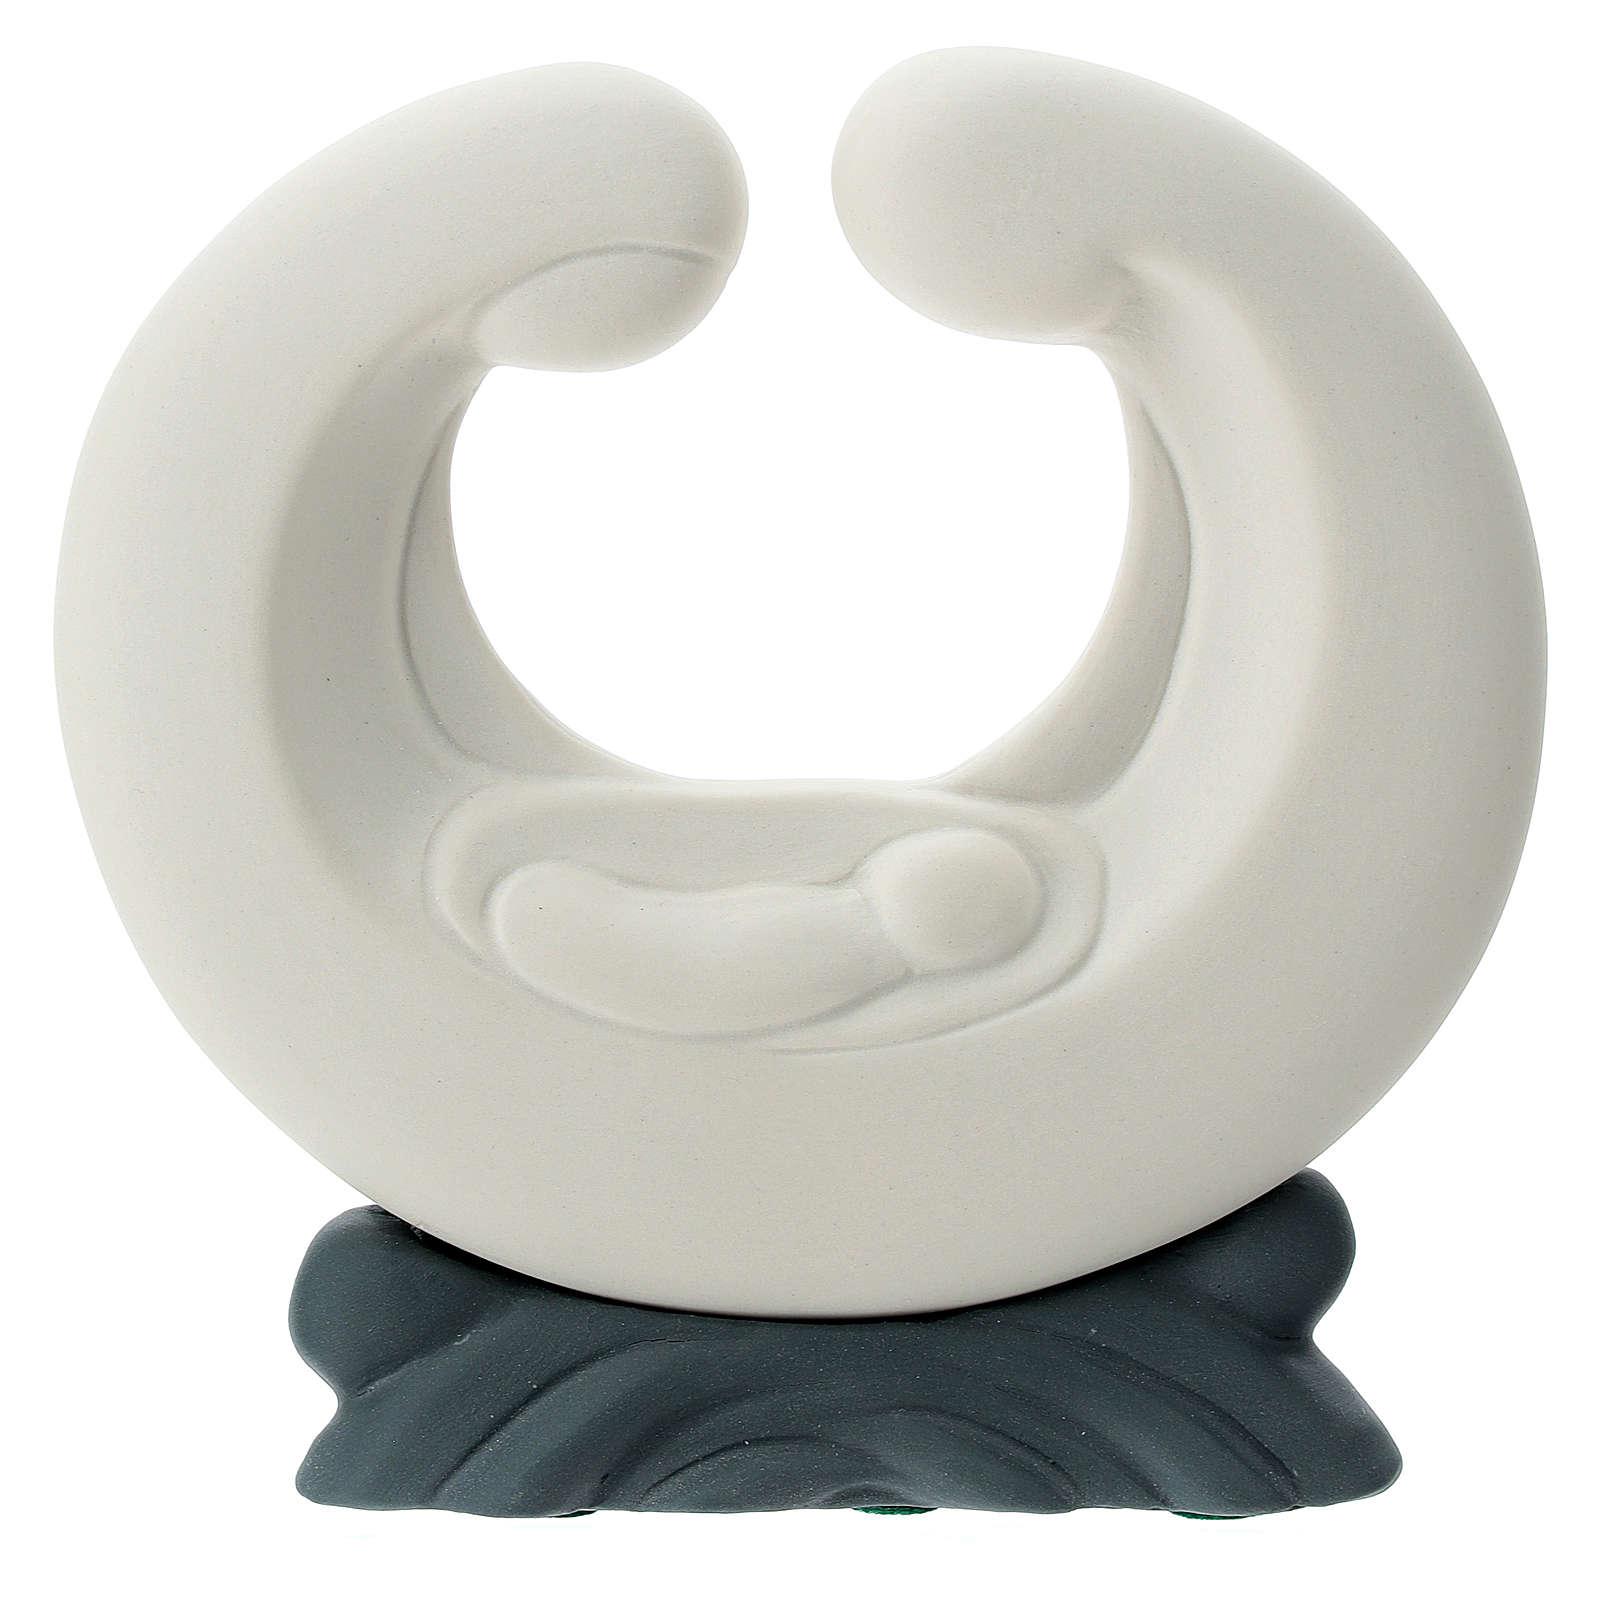 S. Famiglia porcellana bianca base grigia 15 cm 4